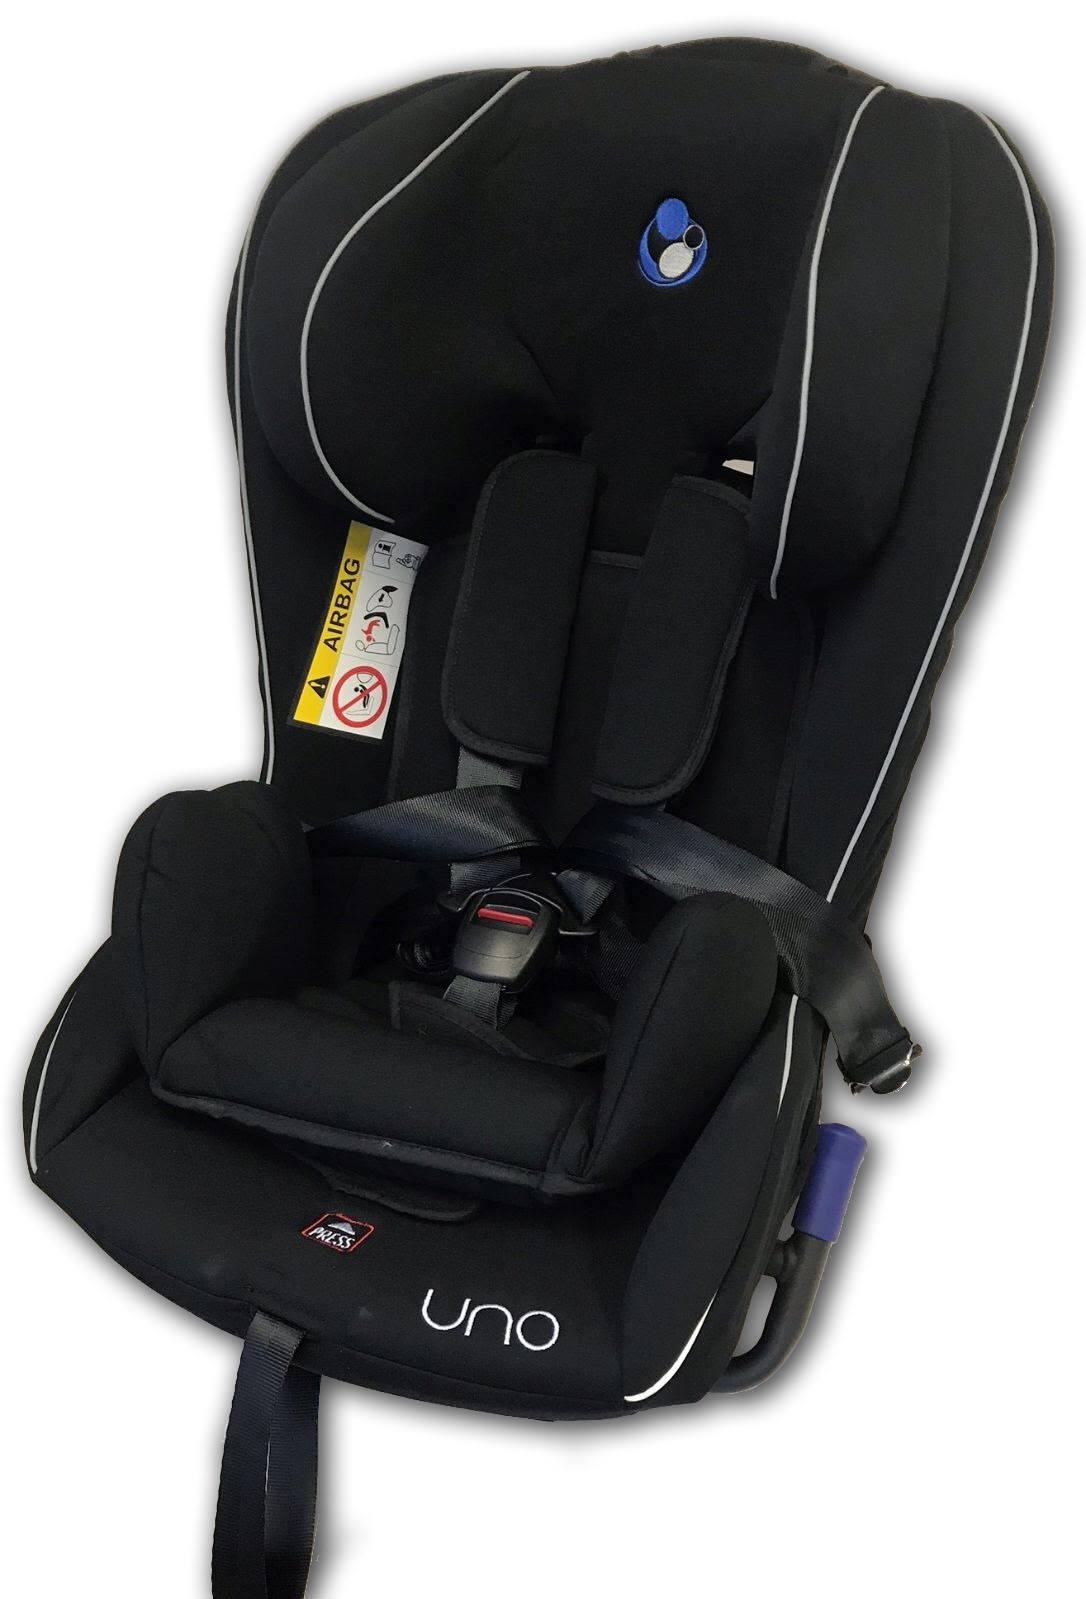 Wob-Uno